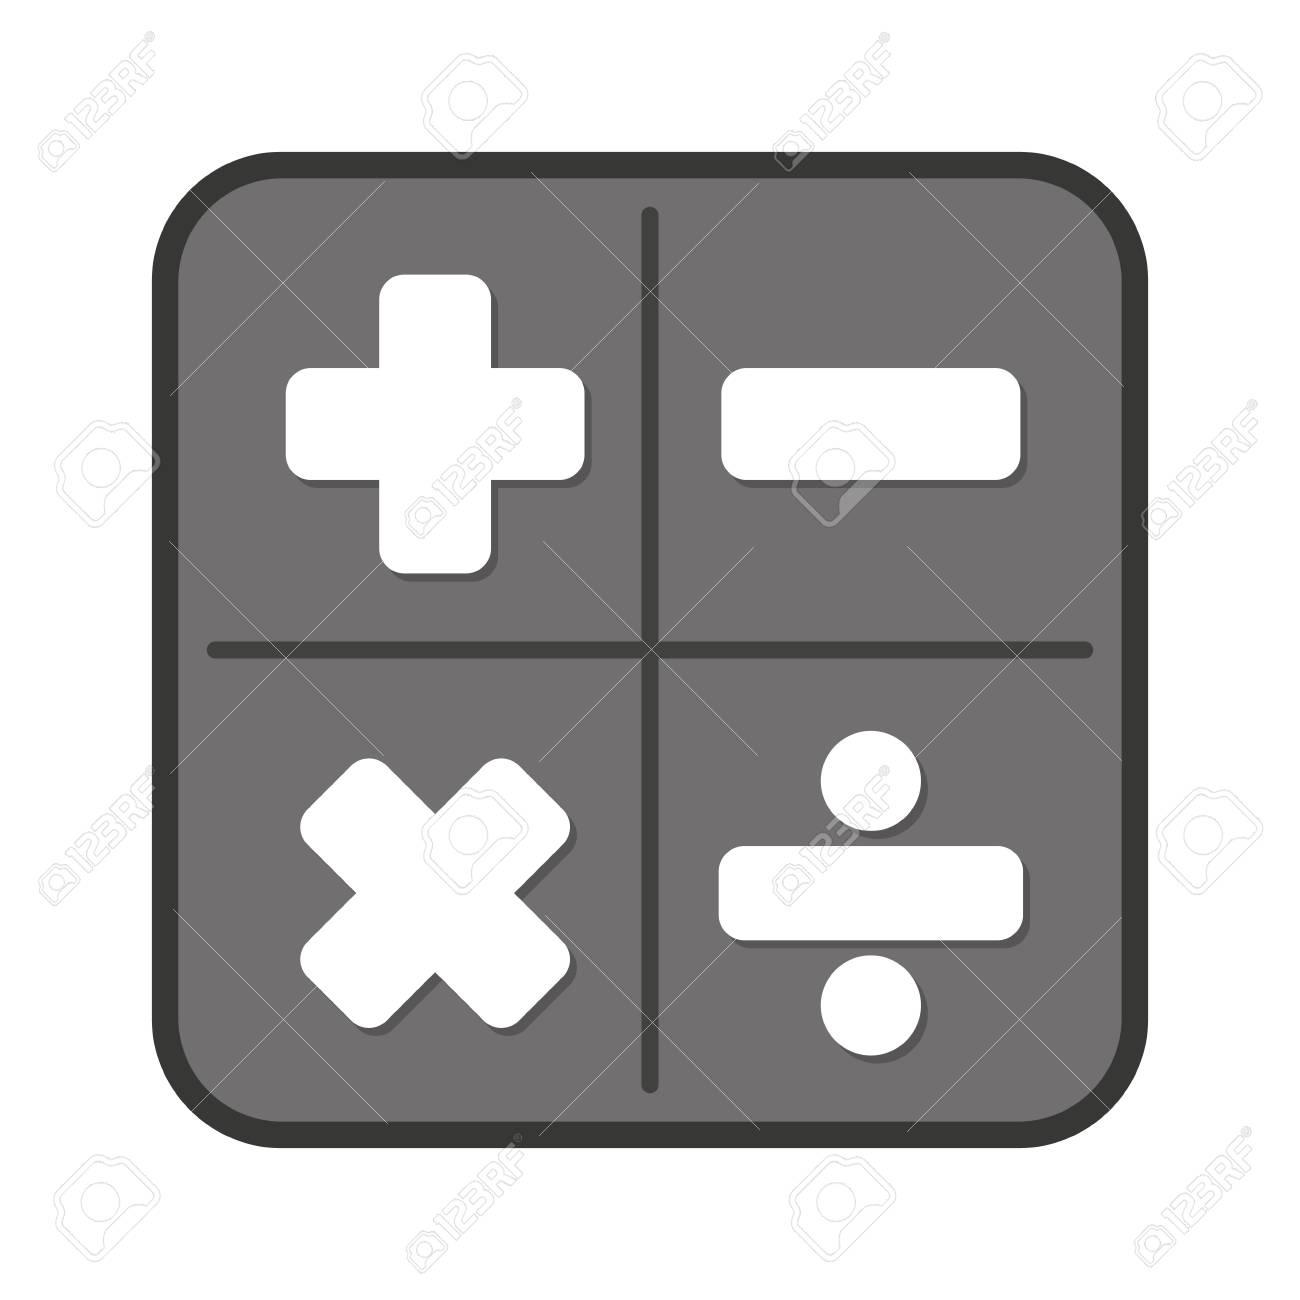 calculator app isolated icon